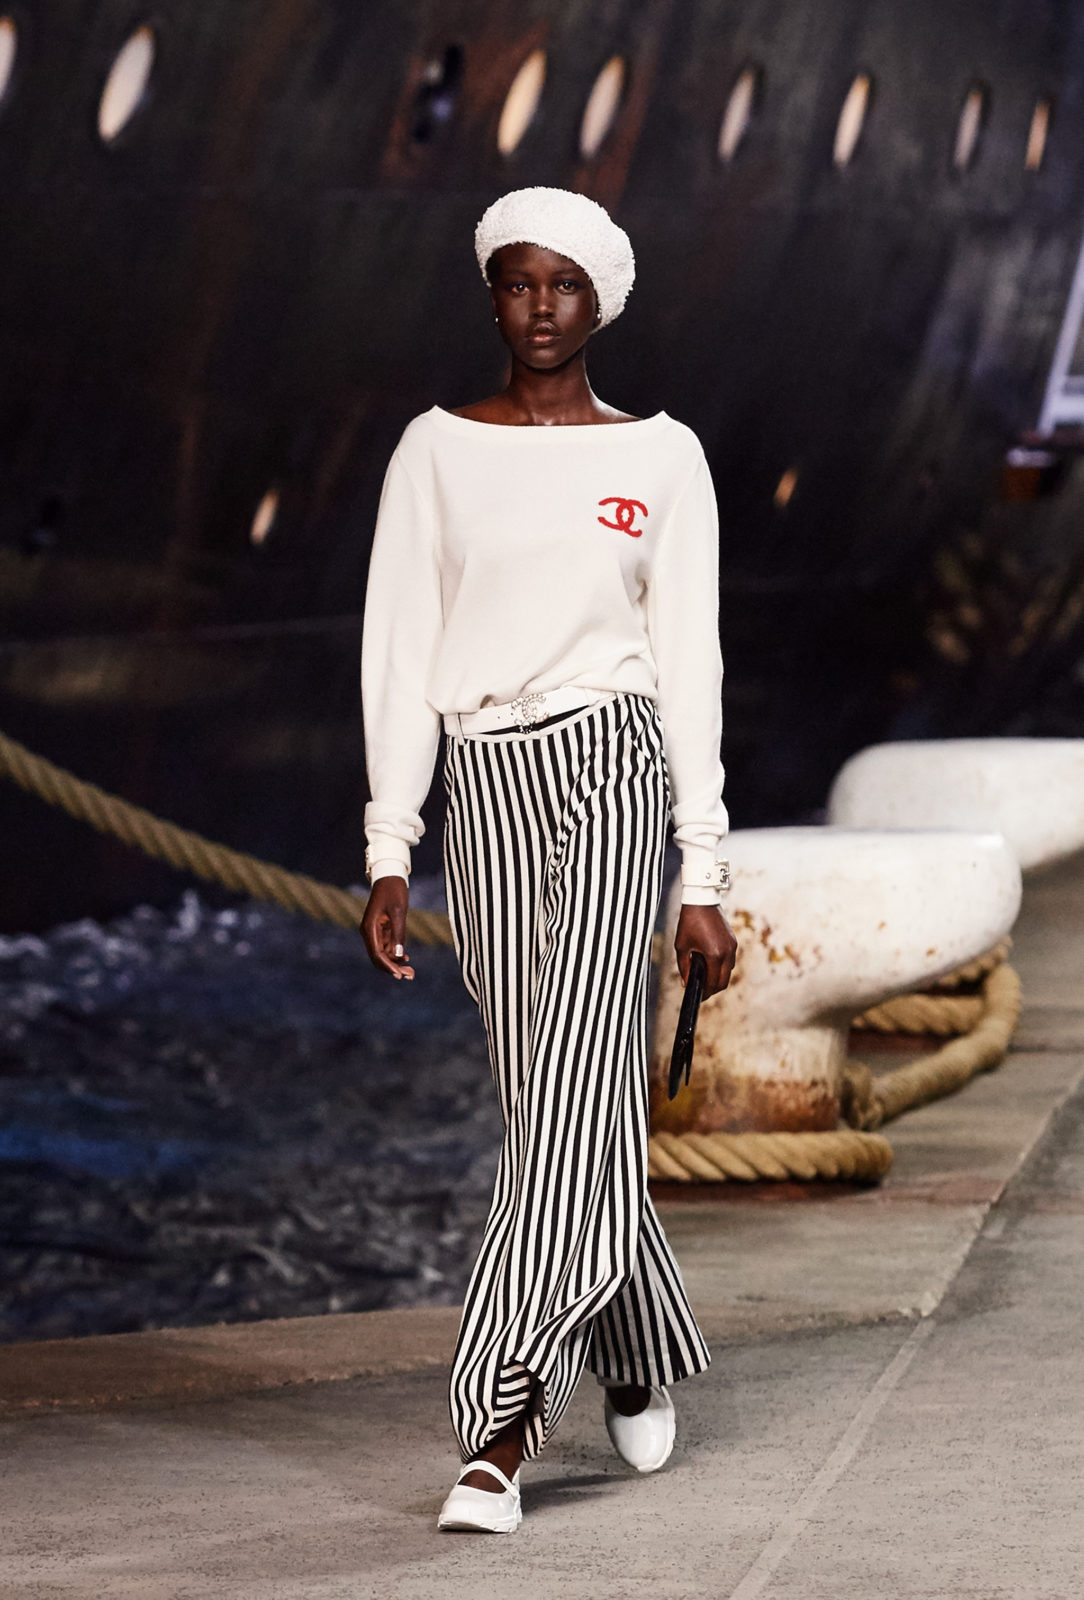 Chanel-Cruise-Collection-2018-2019-La-Pausa-7 - Journelles